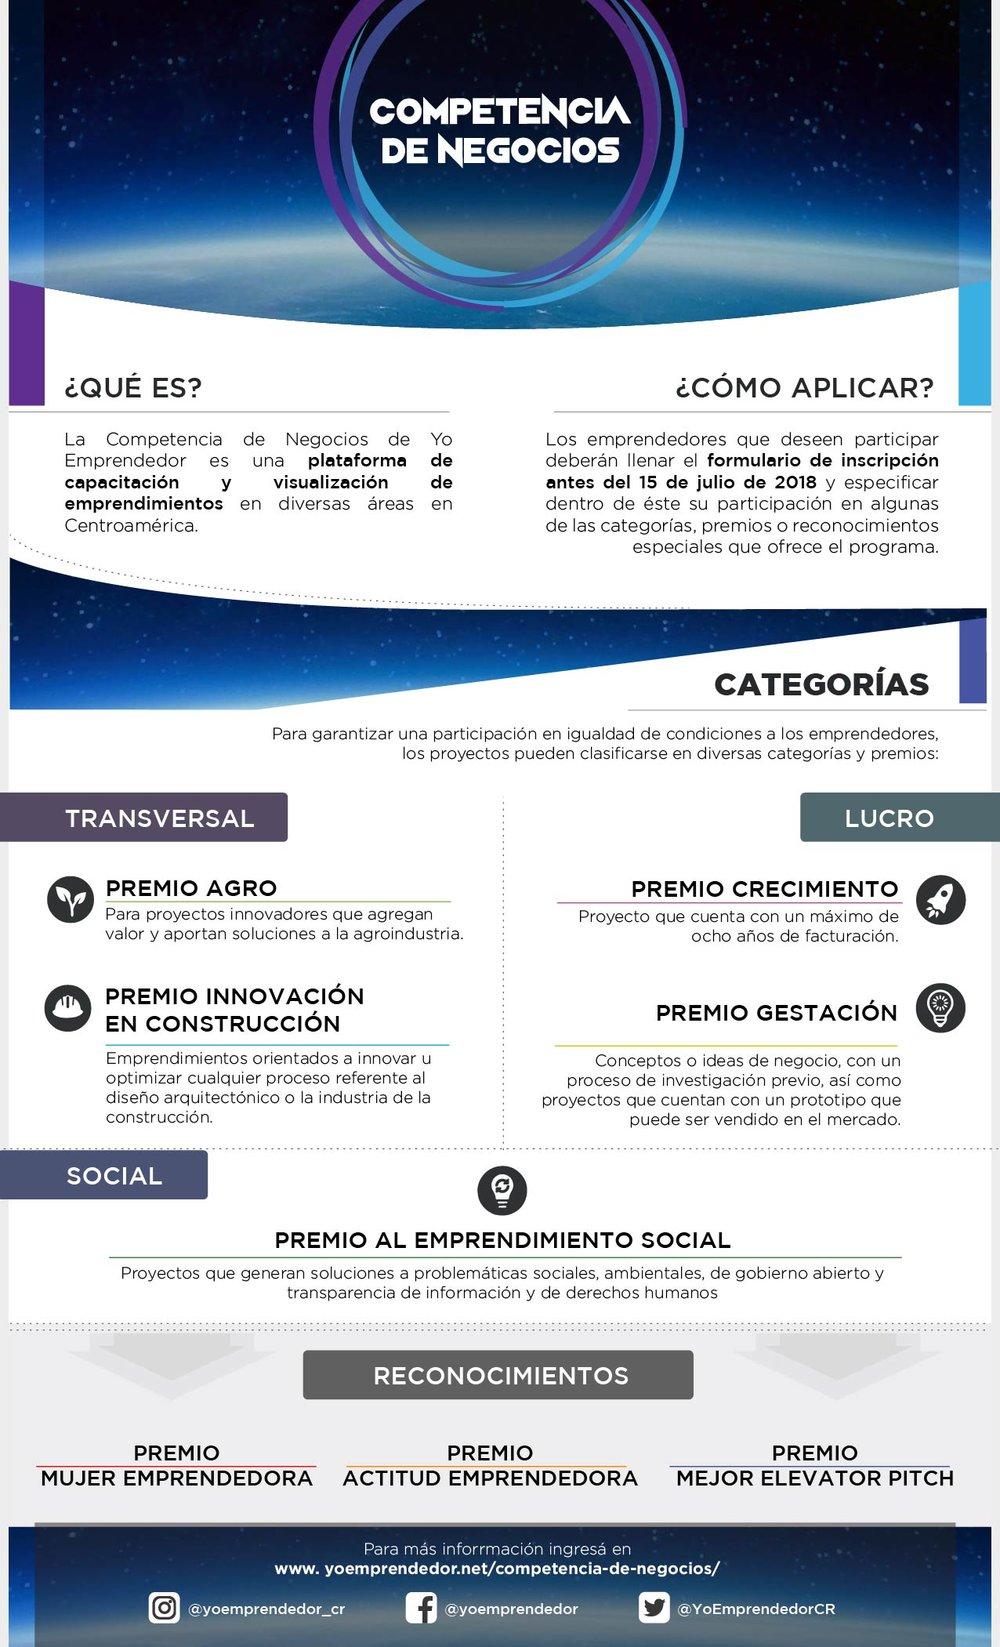 Competencia de Negocios_Infografía.jpg